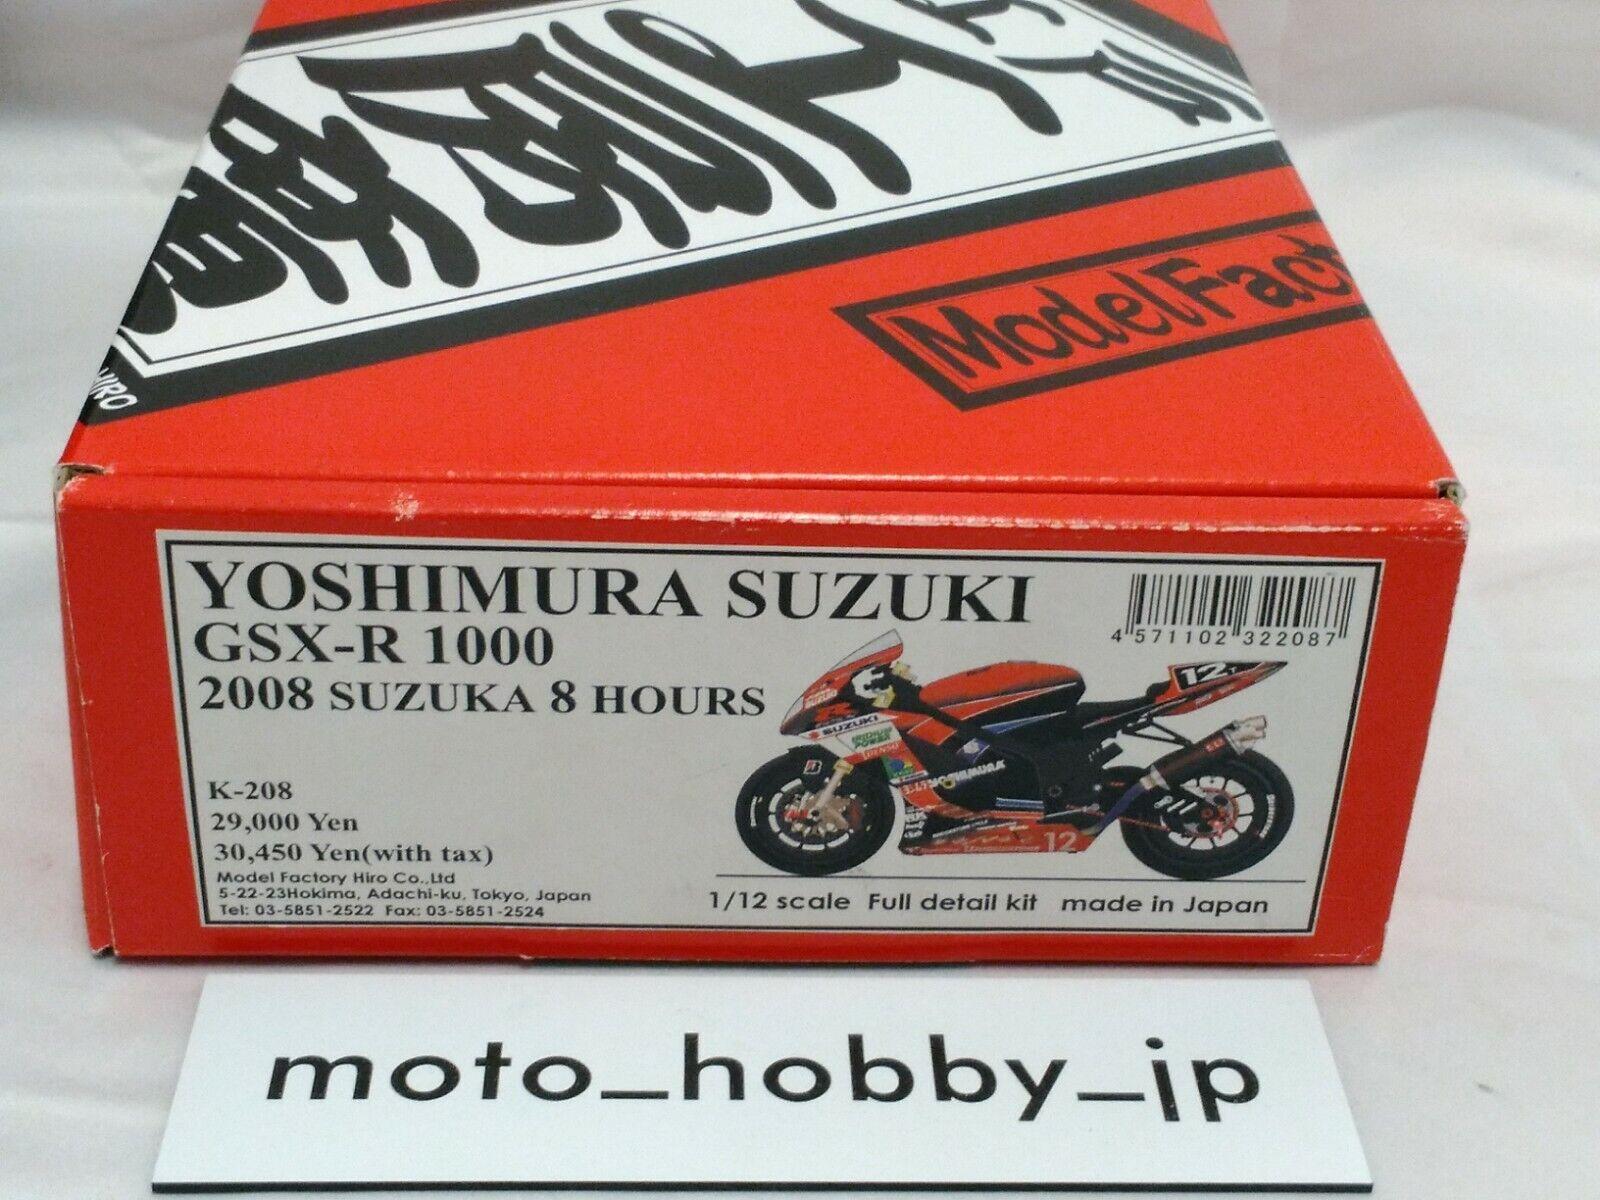 hasta un 60% de descuento Mfh 1 12 Yoshimura Suzuki Gsx-R 1000 '08 '08 '08 Suzuka Full Kit Detalle K-208 Japón  en stock